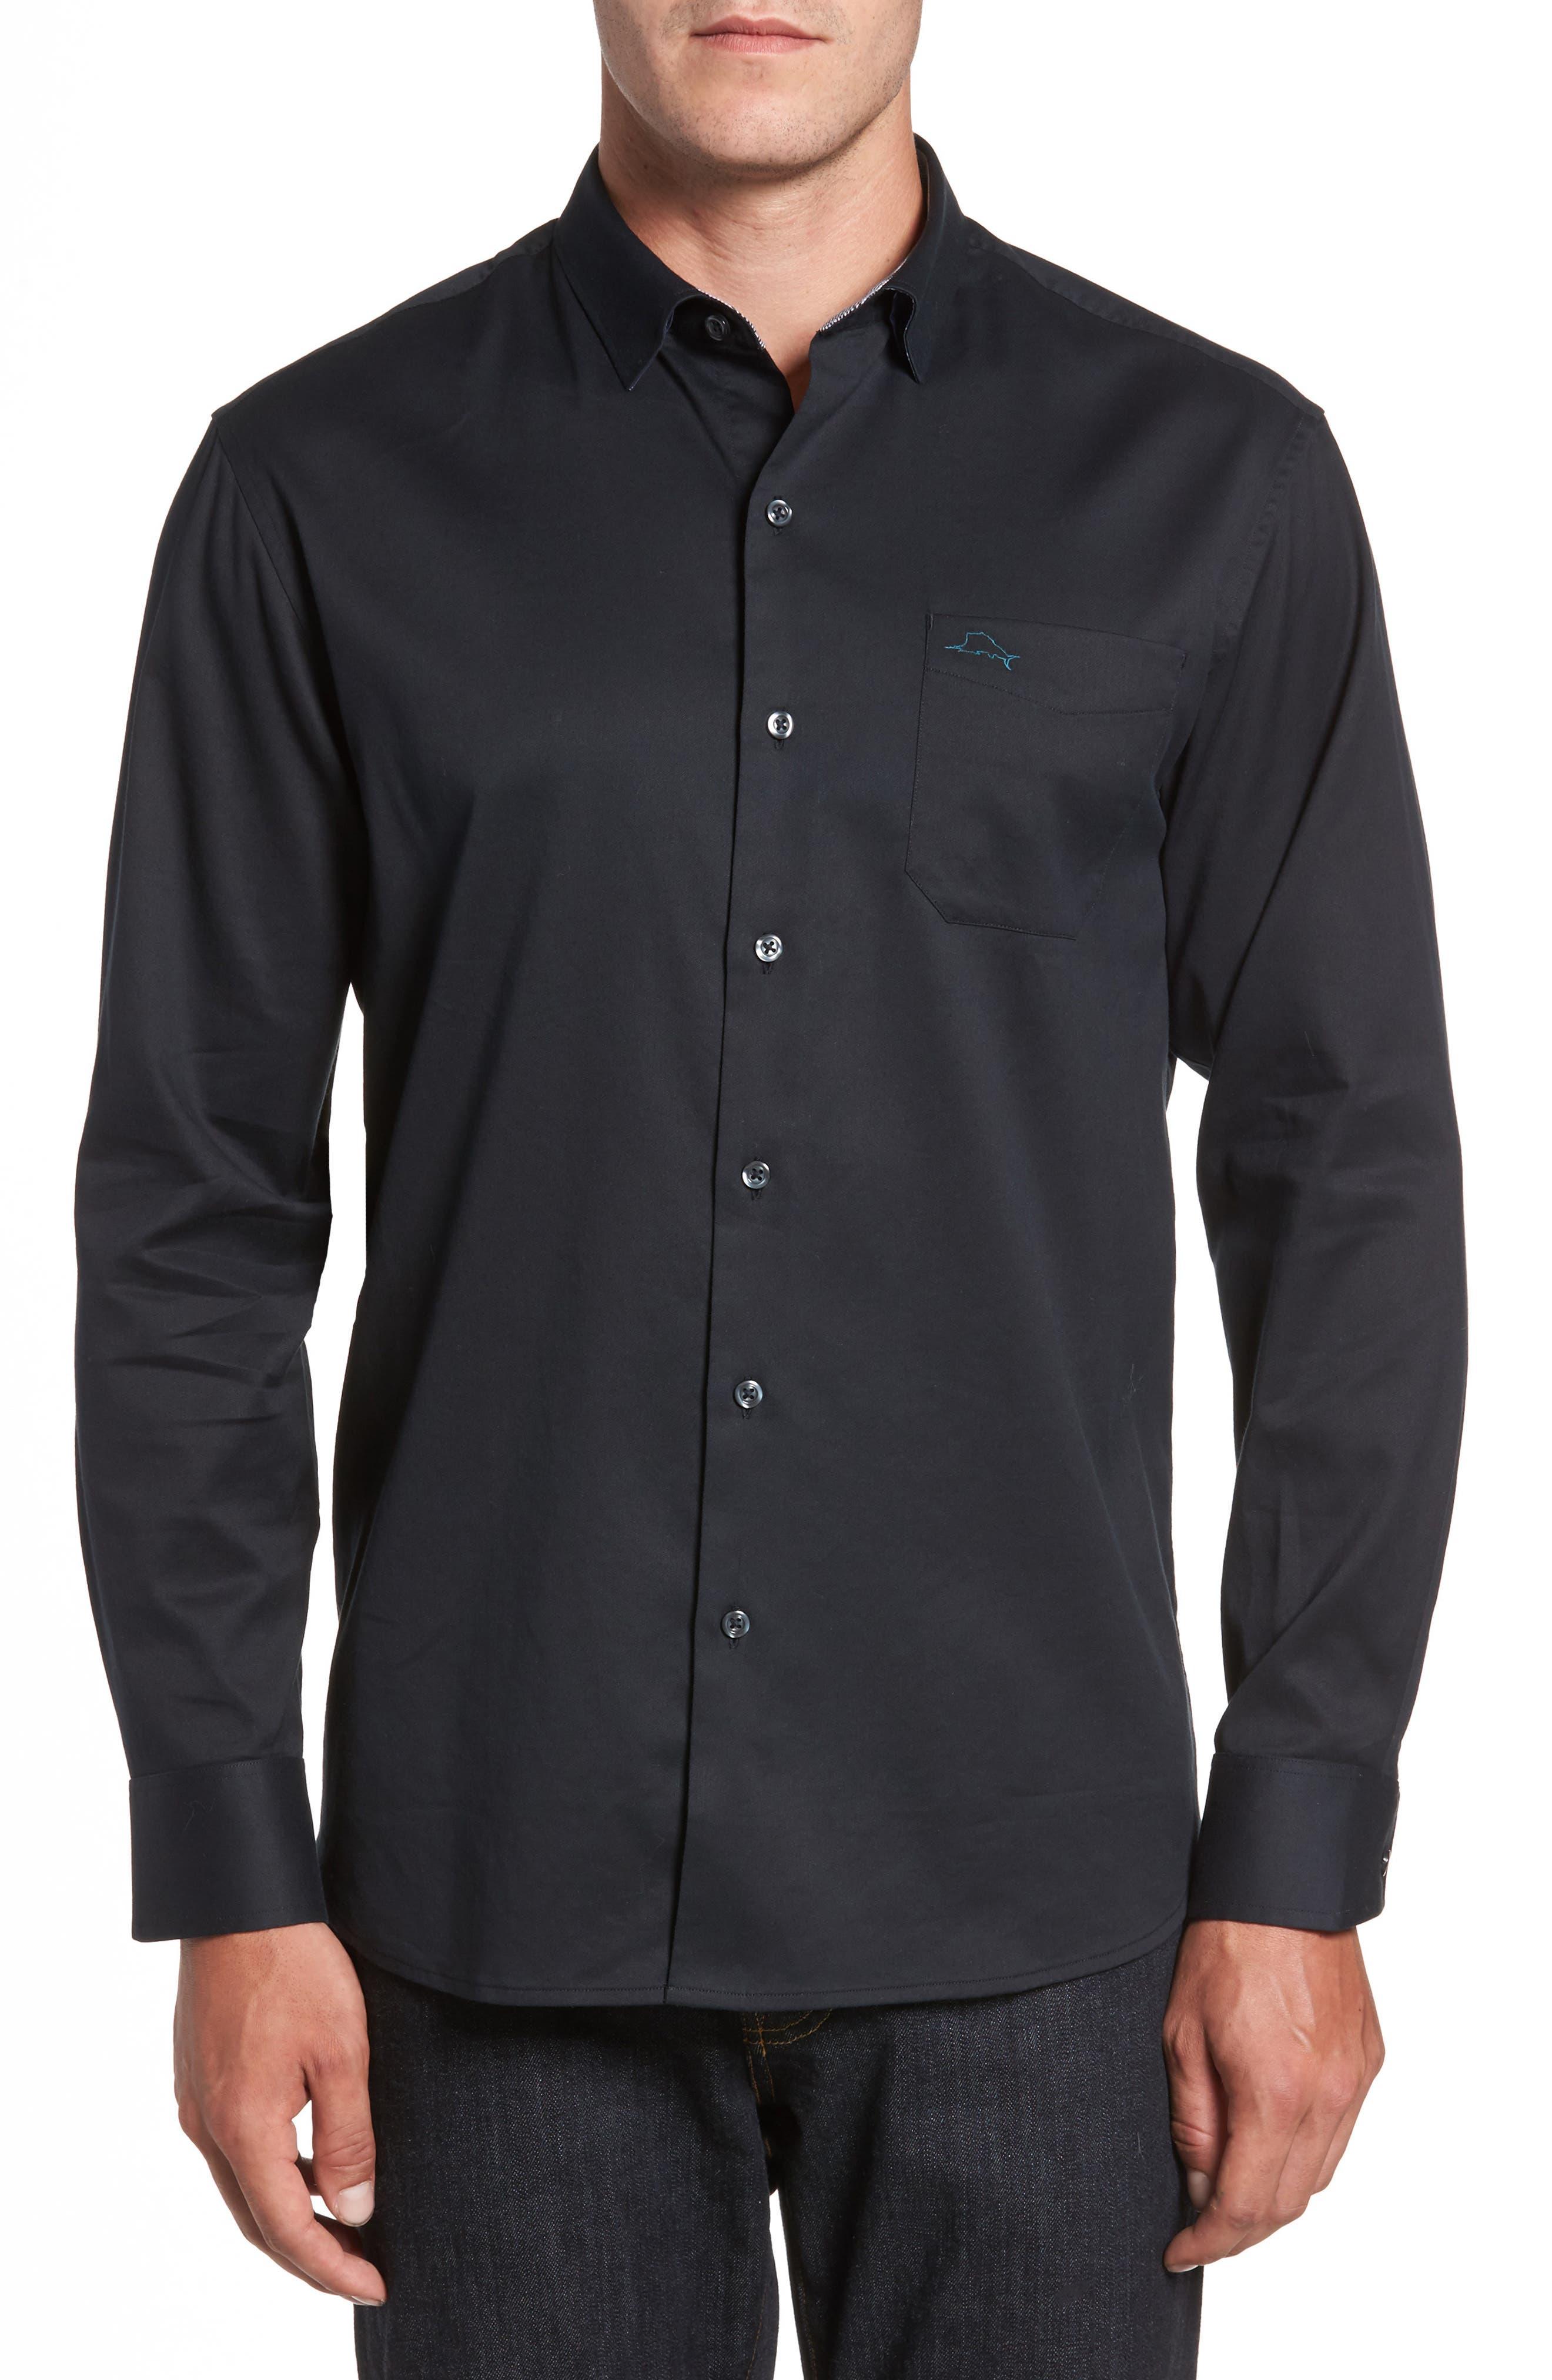 TOMMY BAHAMA,                             Oasis Twill Sport Shirt,                             Main thumbnail 1, color,                             001